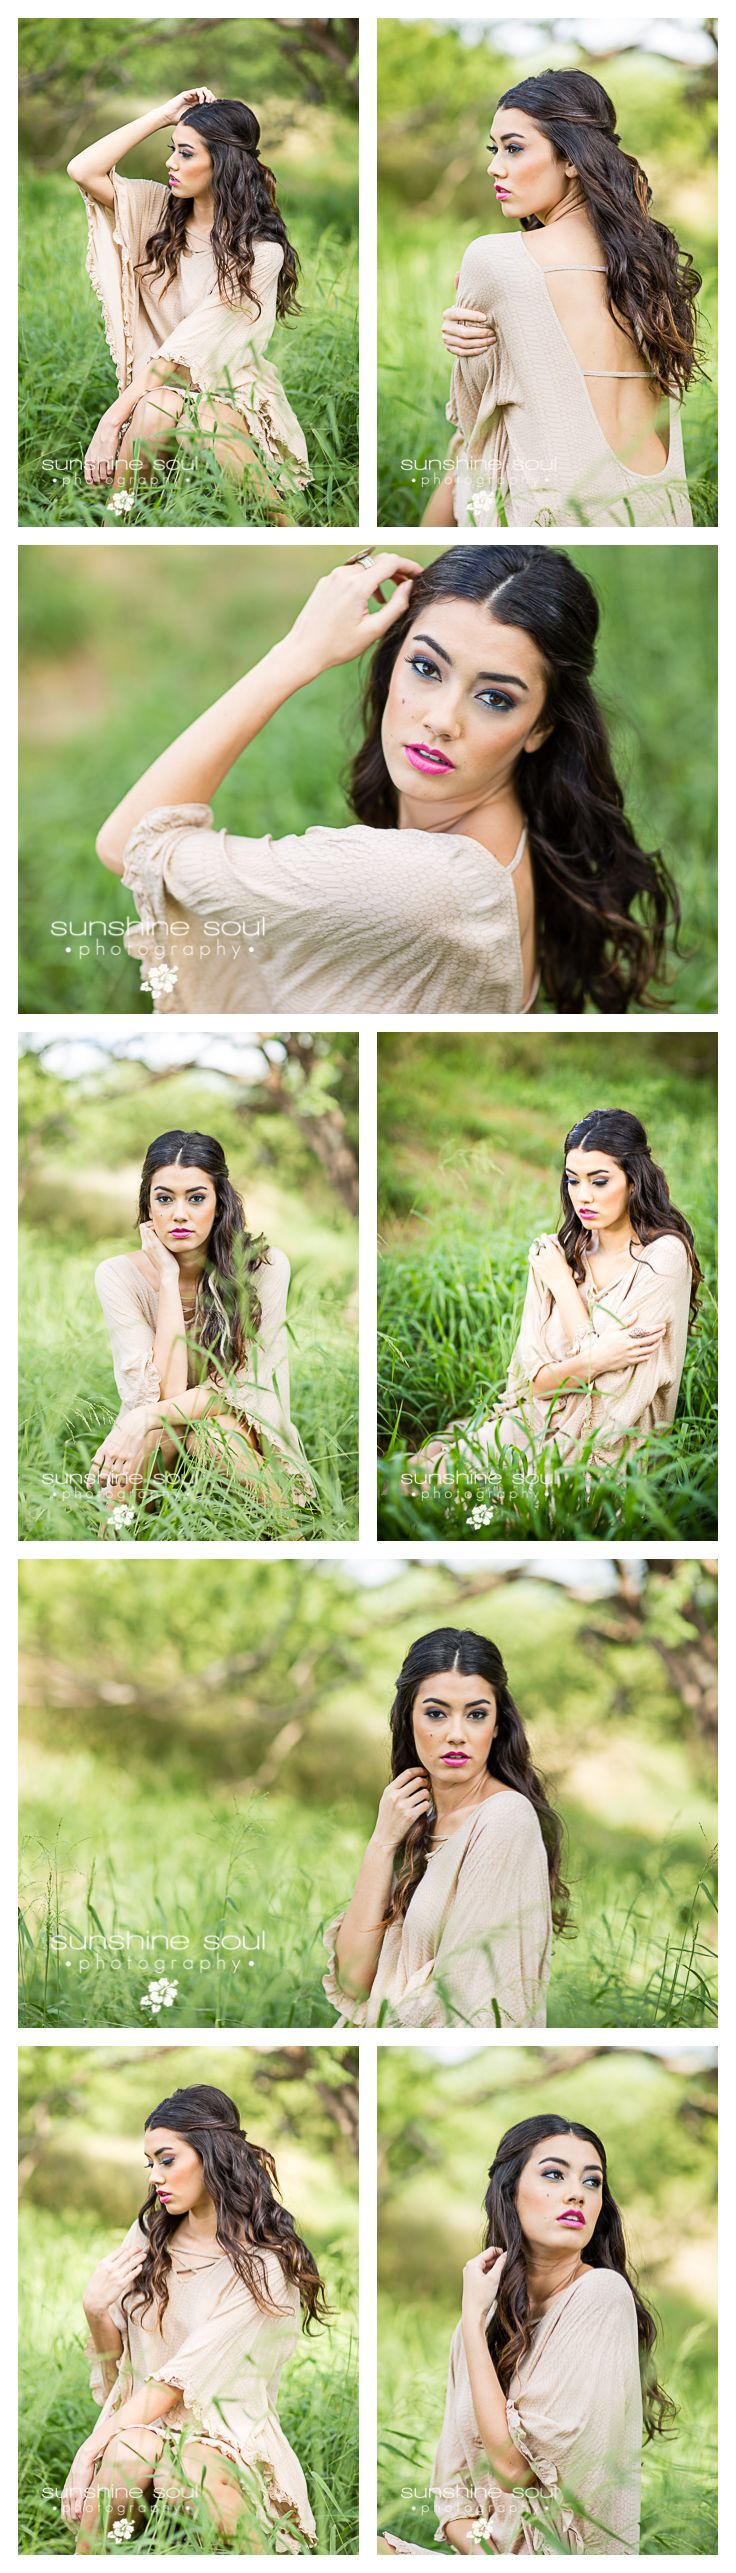 Senior Portrait Hair and Makeup Inspiration - BOHO Styled Shoot (Okinawa Senior Portrait Photographer Jennifer Buchanan - Sunshine Soul Photography)